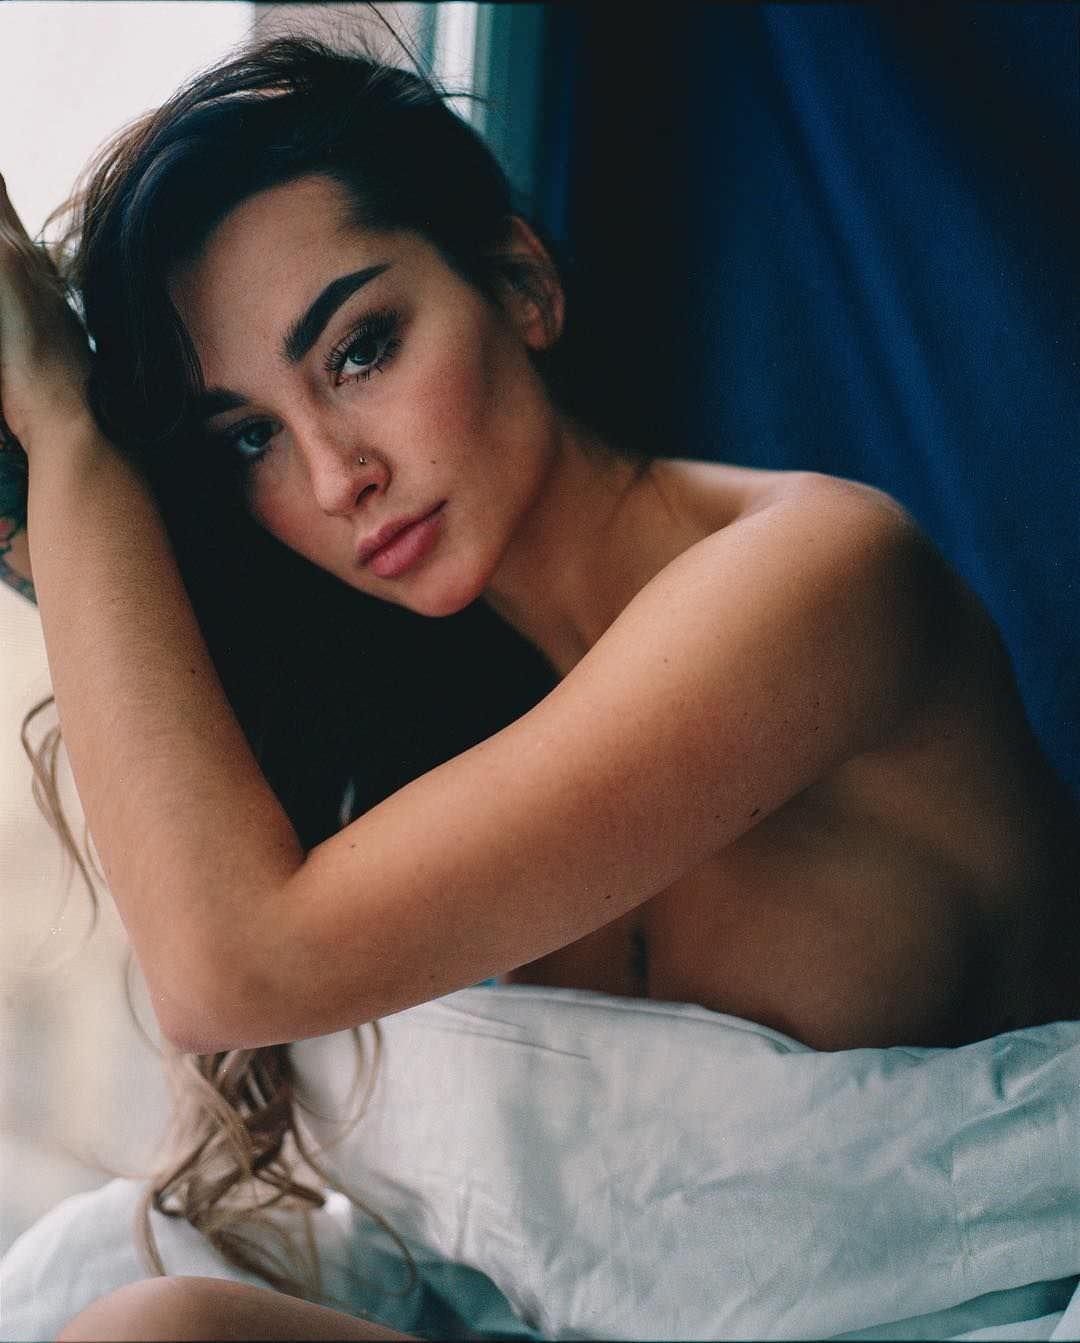 Анжелика Андерсон фото с одеялом